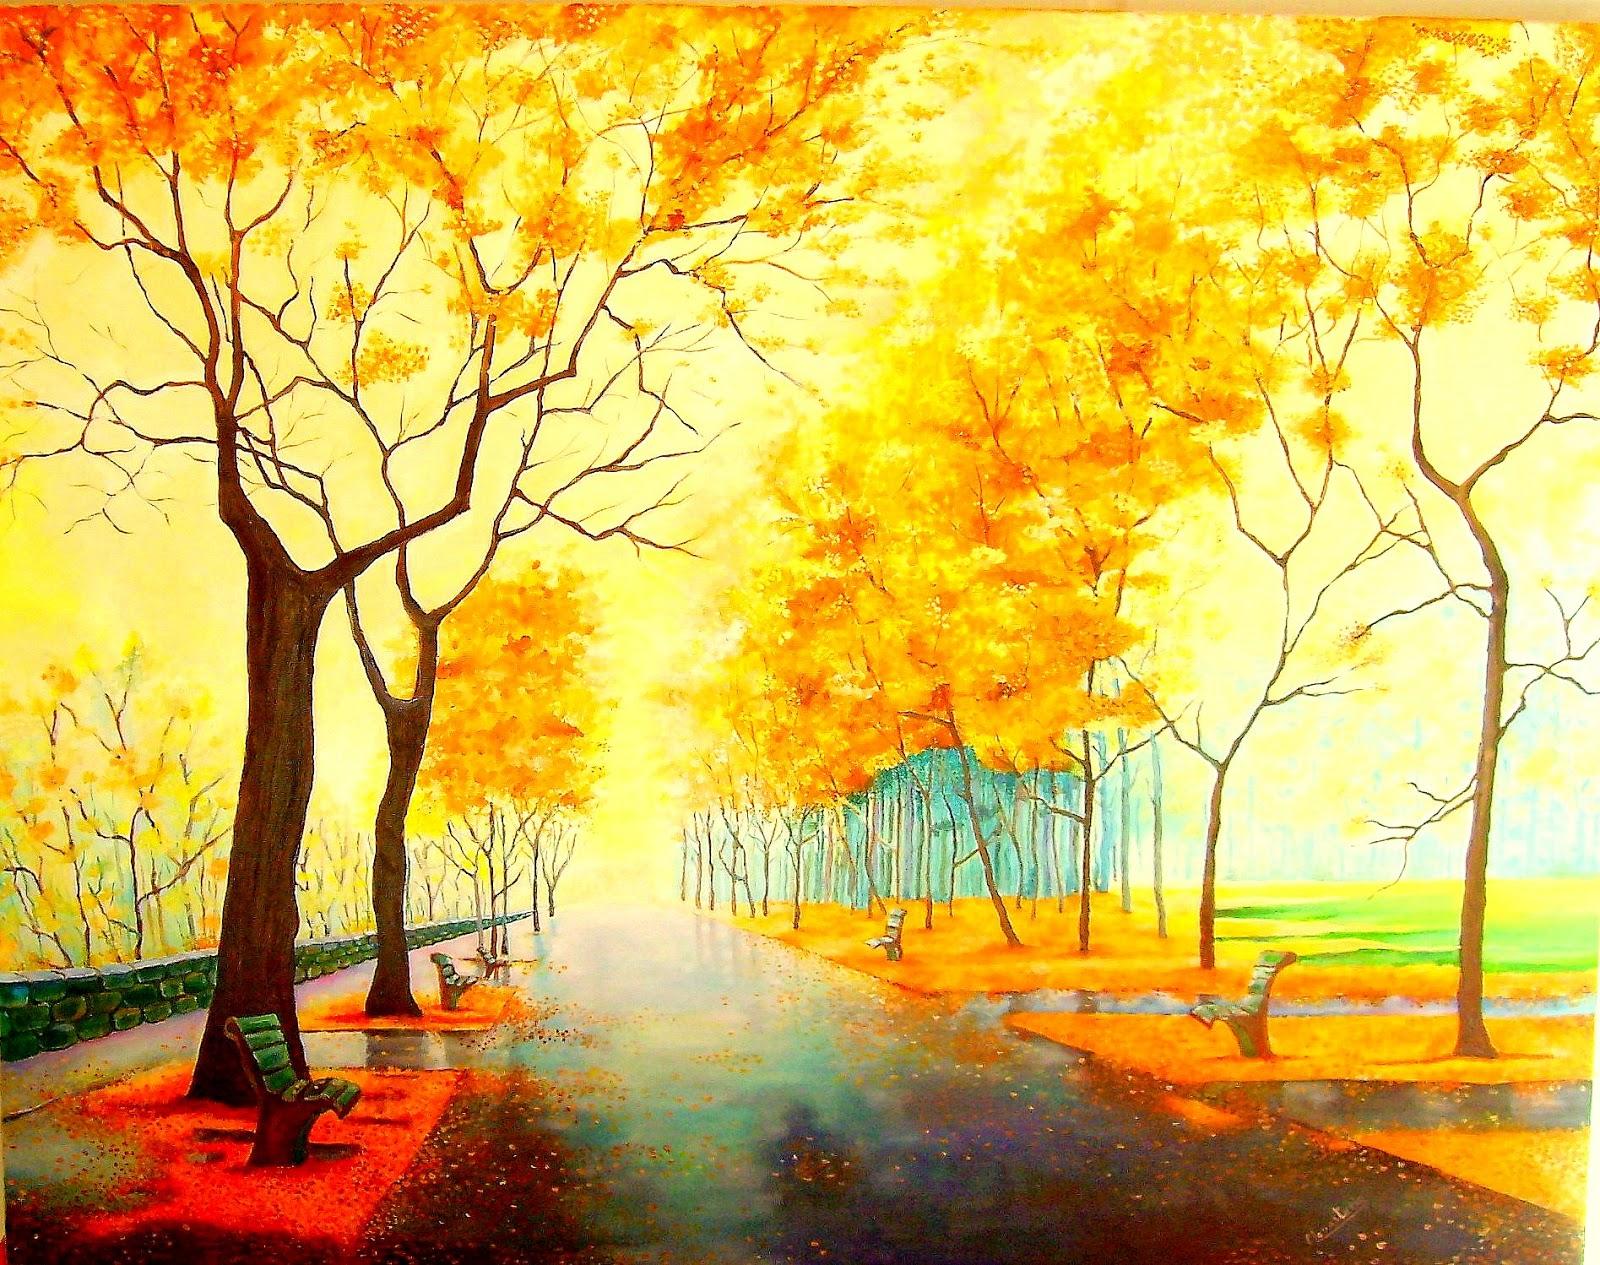 Imagenes De Para Pintar - Dibujos para Colorear pintar e imprimir